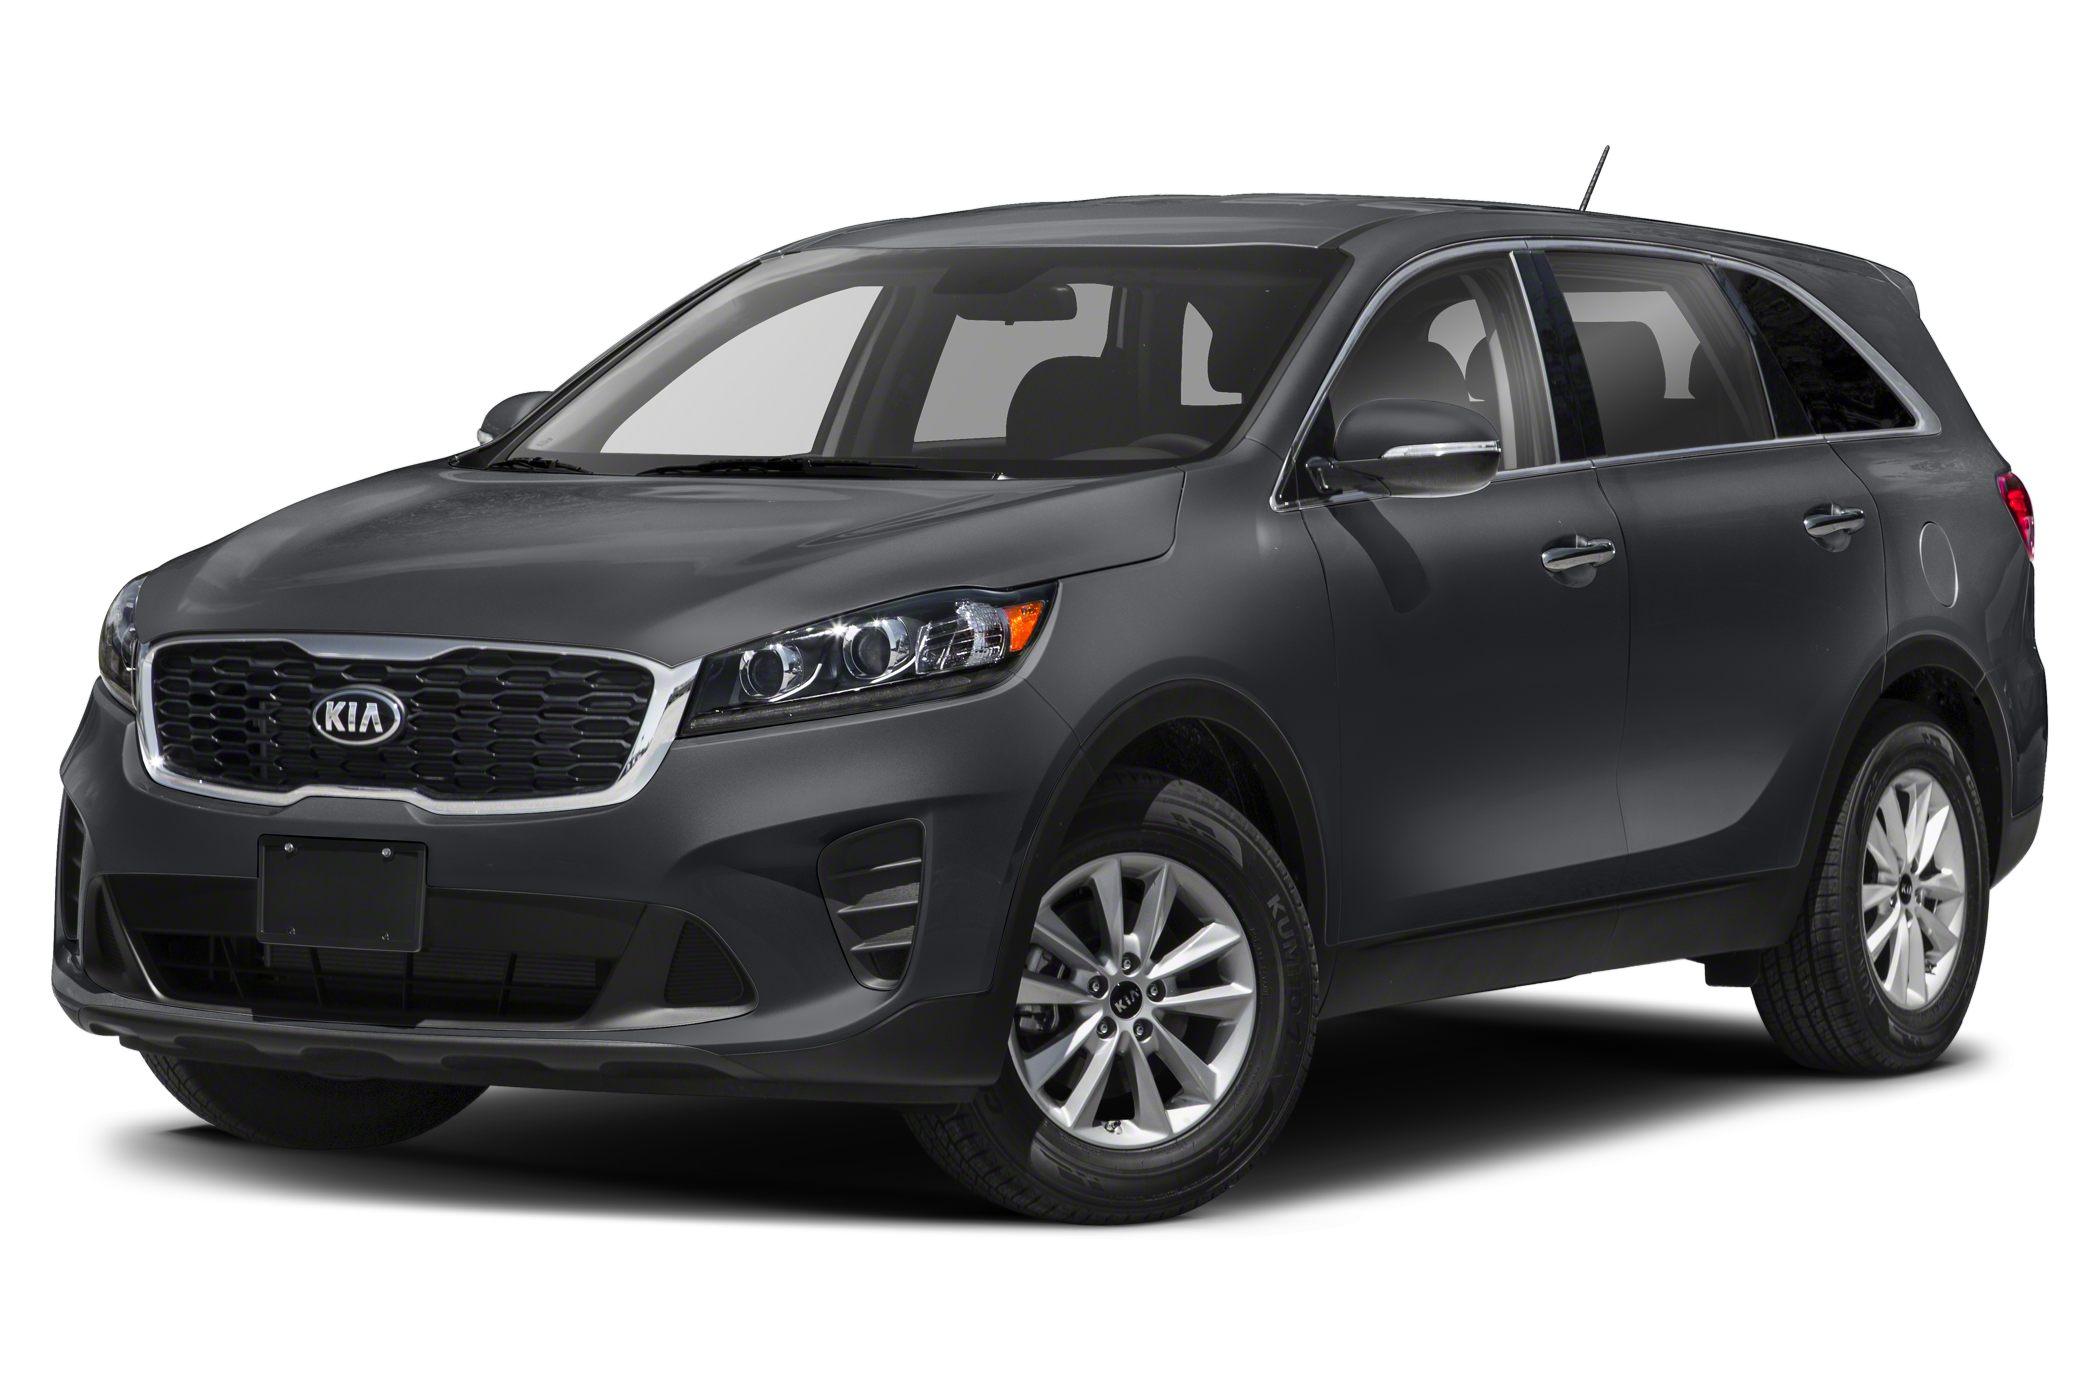 2019 Kia Sorento 2 4l L 4dr Front Wheel Drive Specs And Prices